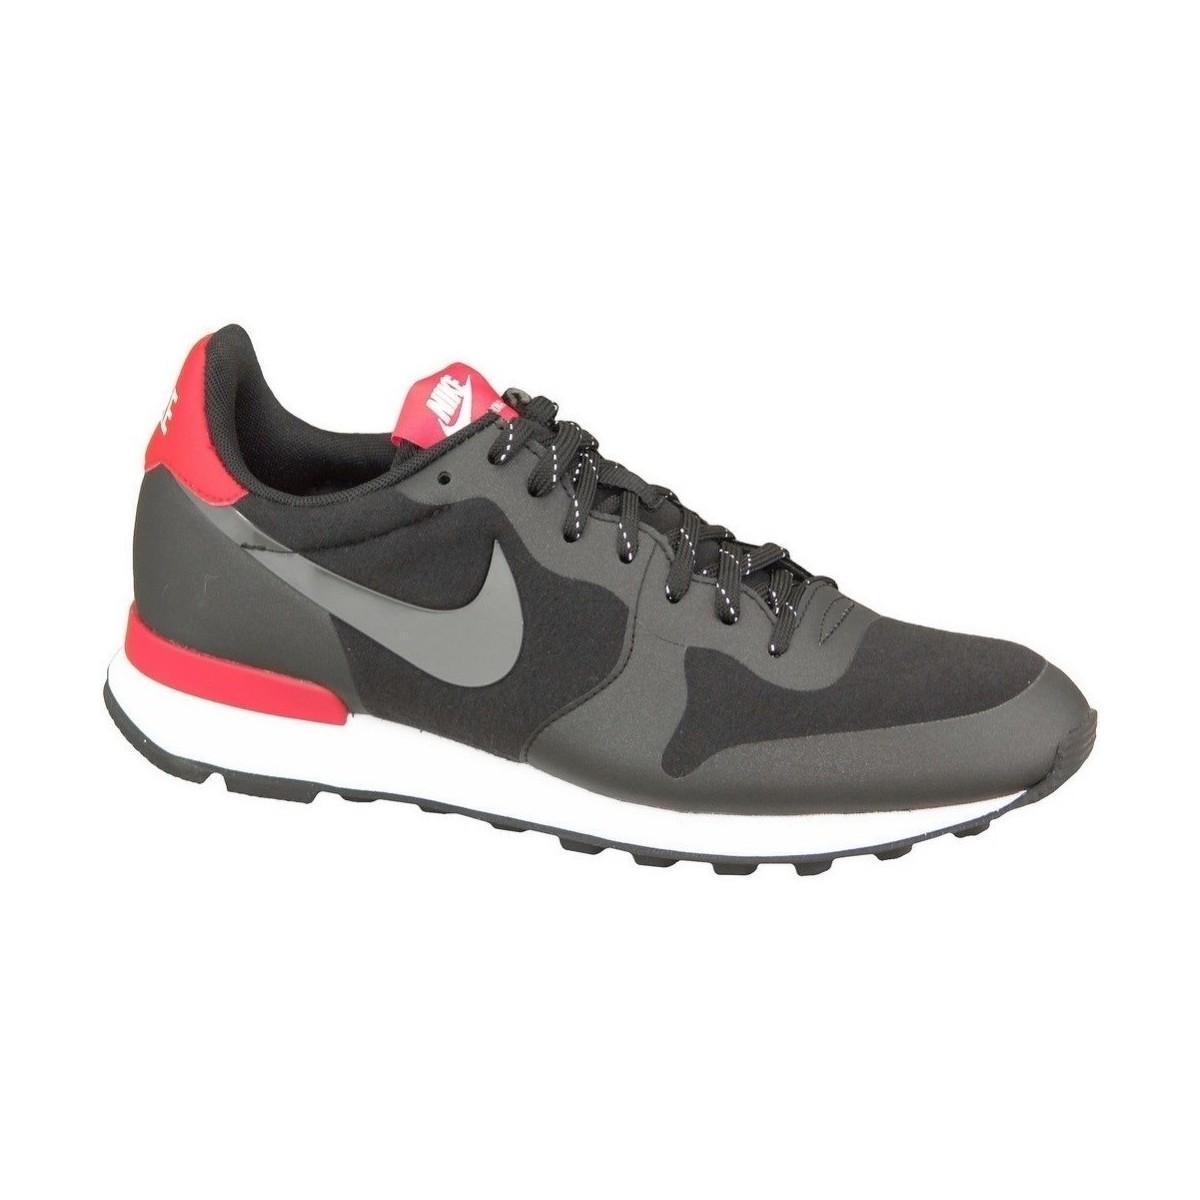 Nike Wmns Internationalist Women's Shoes (trainers) In Black